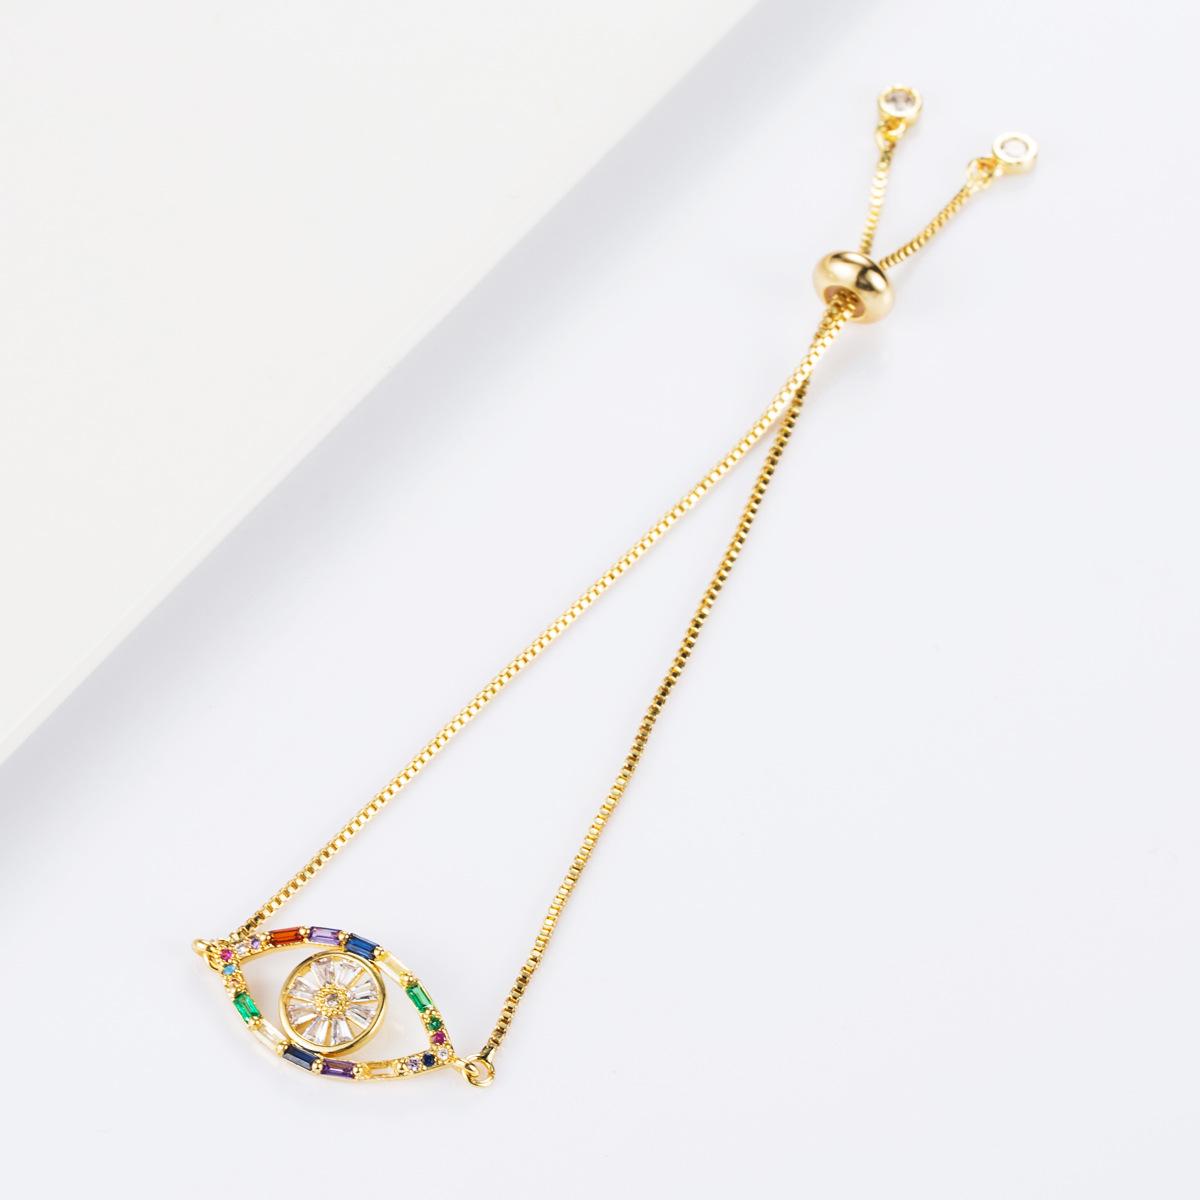 Fashion copper inlaid zircon pull color crystal bracelet NHLN155100